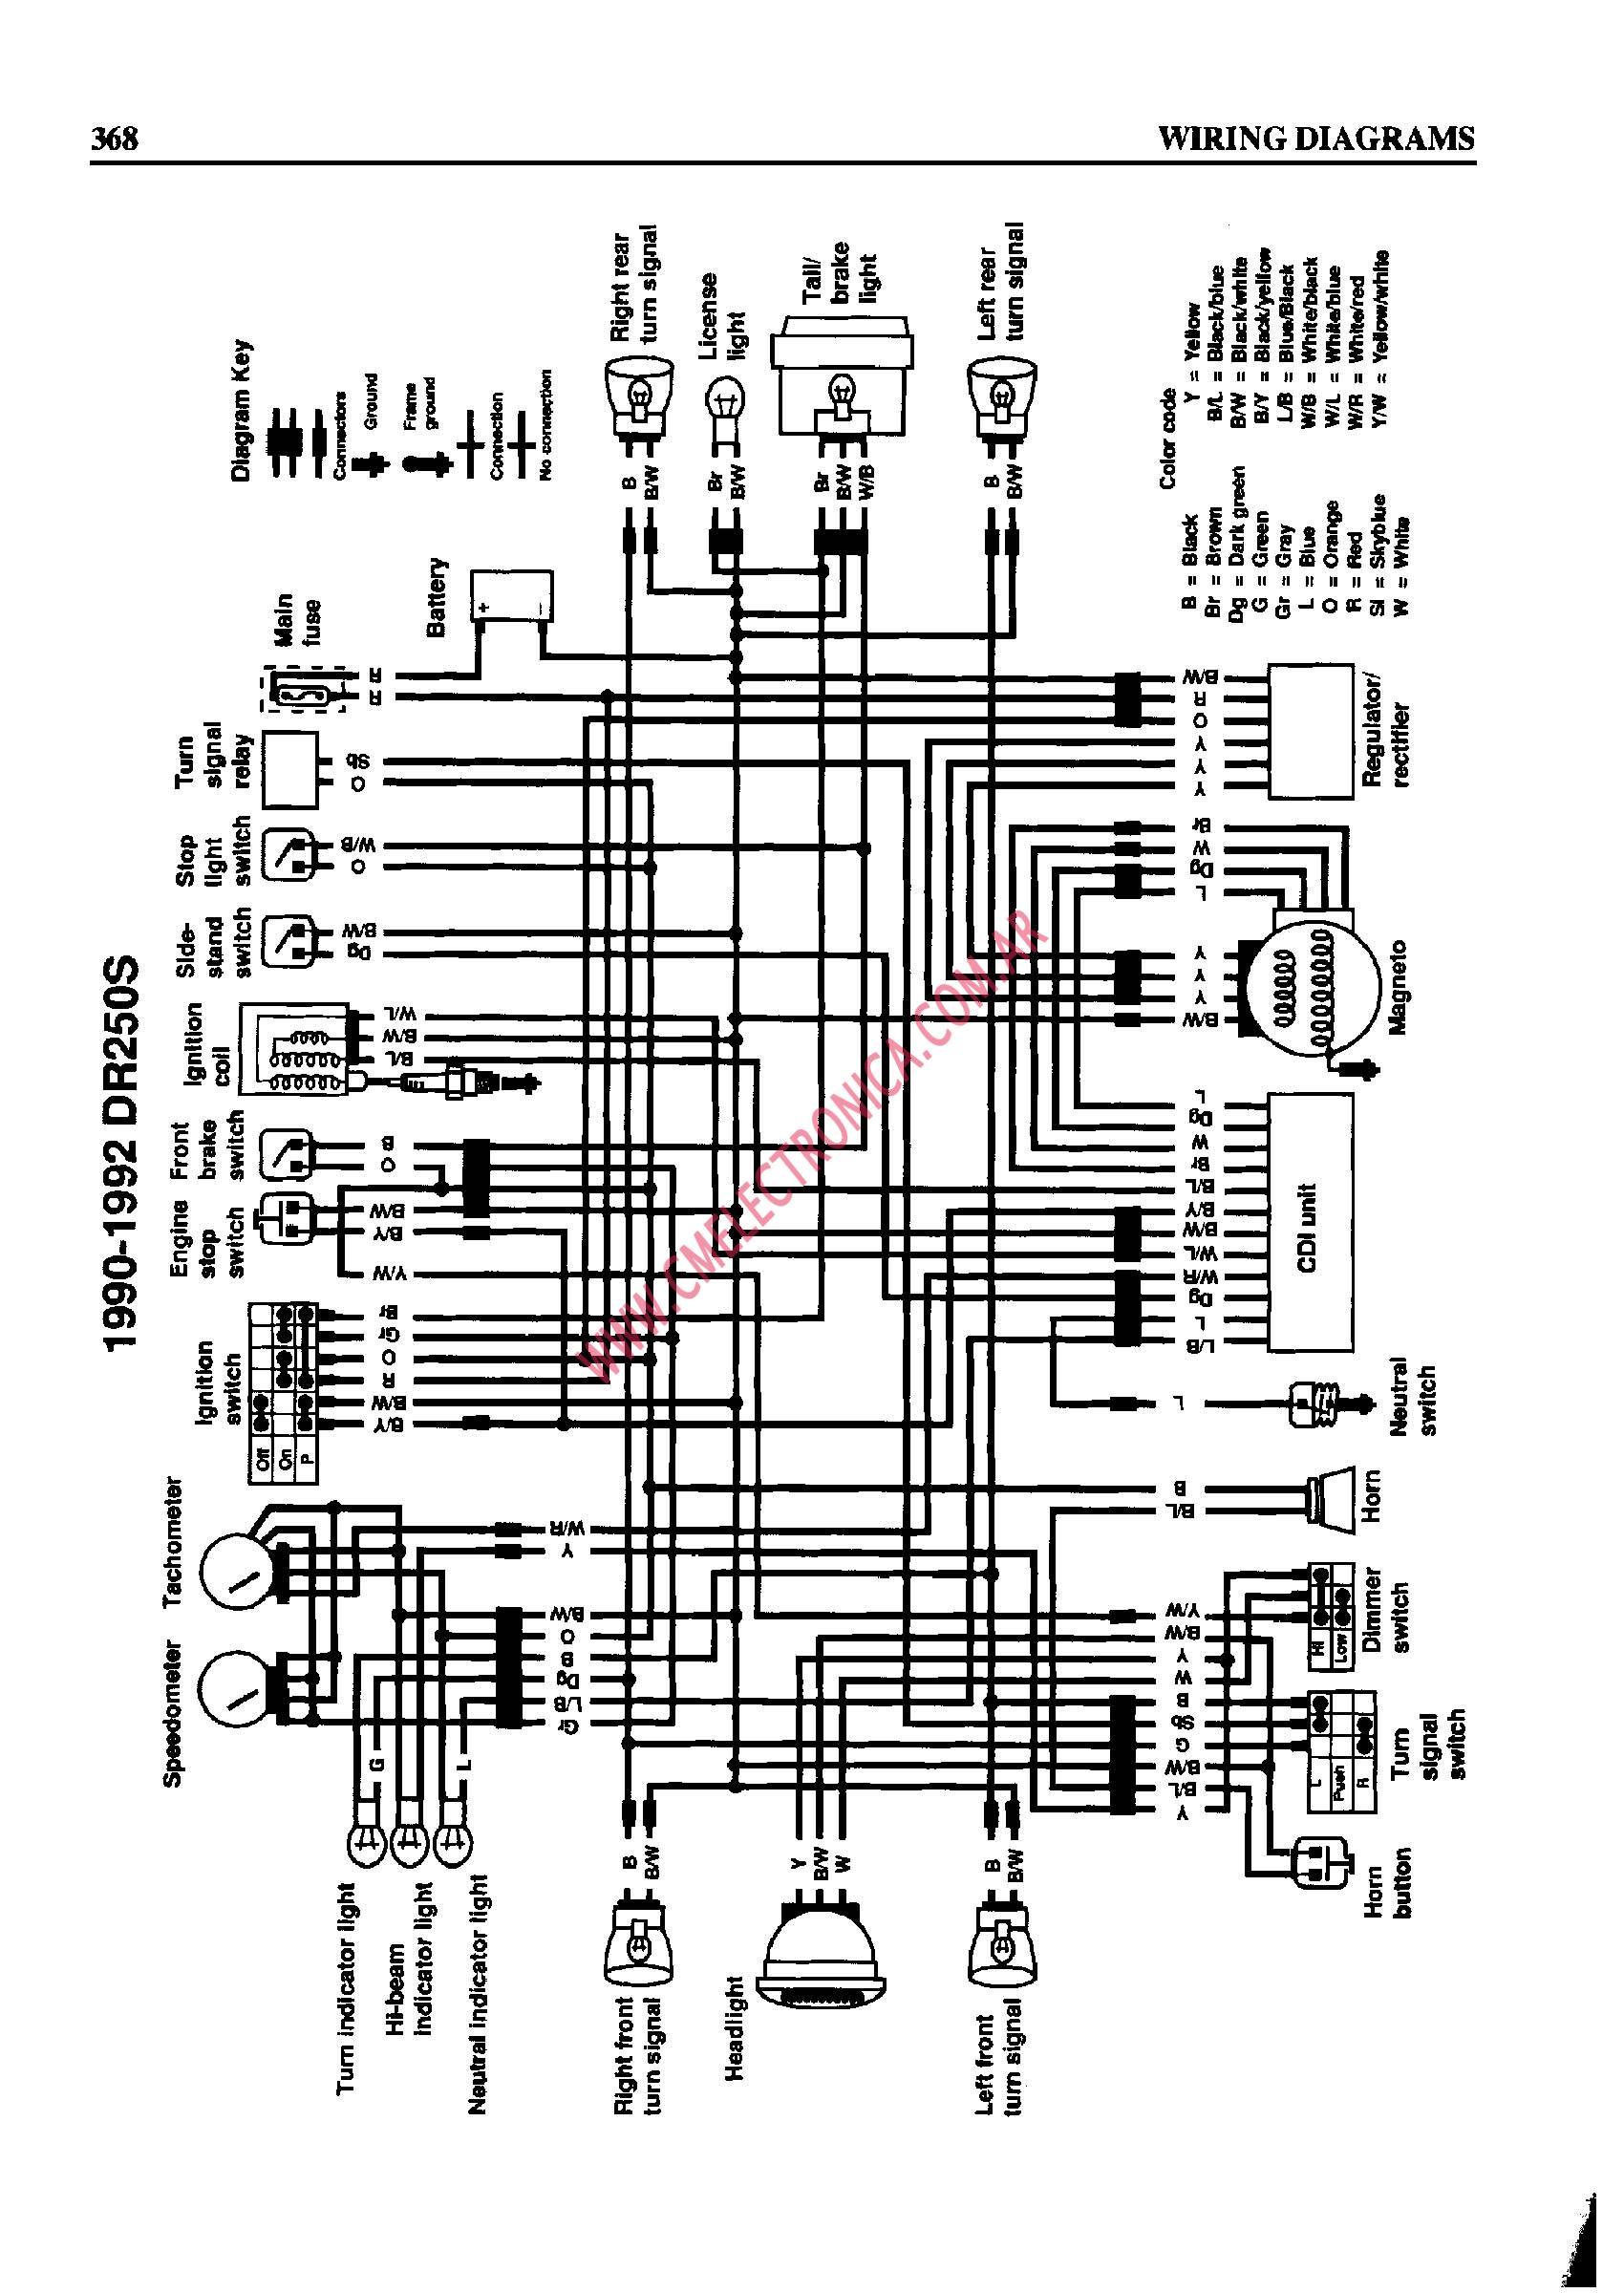 Honda 420 Rancher Wiring Diagram besides 544sj 2005 Kawasaki 250 Bayou Cleaned Carb furthermore 1998 Honda Trx300 Carburetor Diagram as well 345678 2007 Sunl 110cc Atv Wiring Nightmare moreover Polaris Xplorer 400 1998 Wiring Diagram. on kawasaki bayou 250 wiring diagram